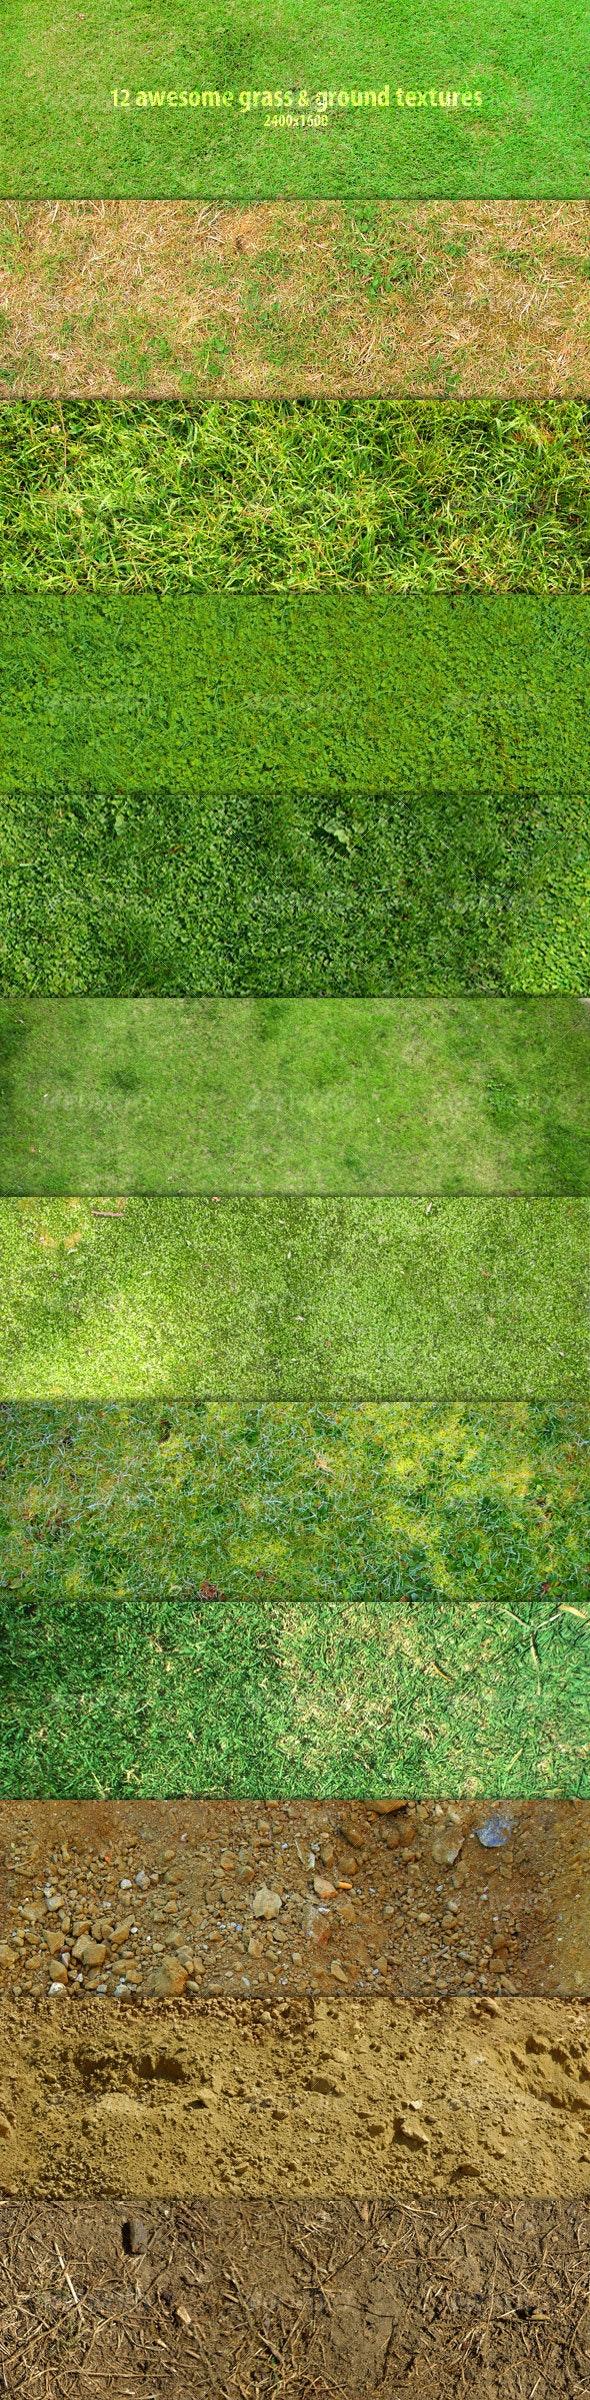 12 Grass & Ground Textures - Nature Textures